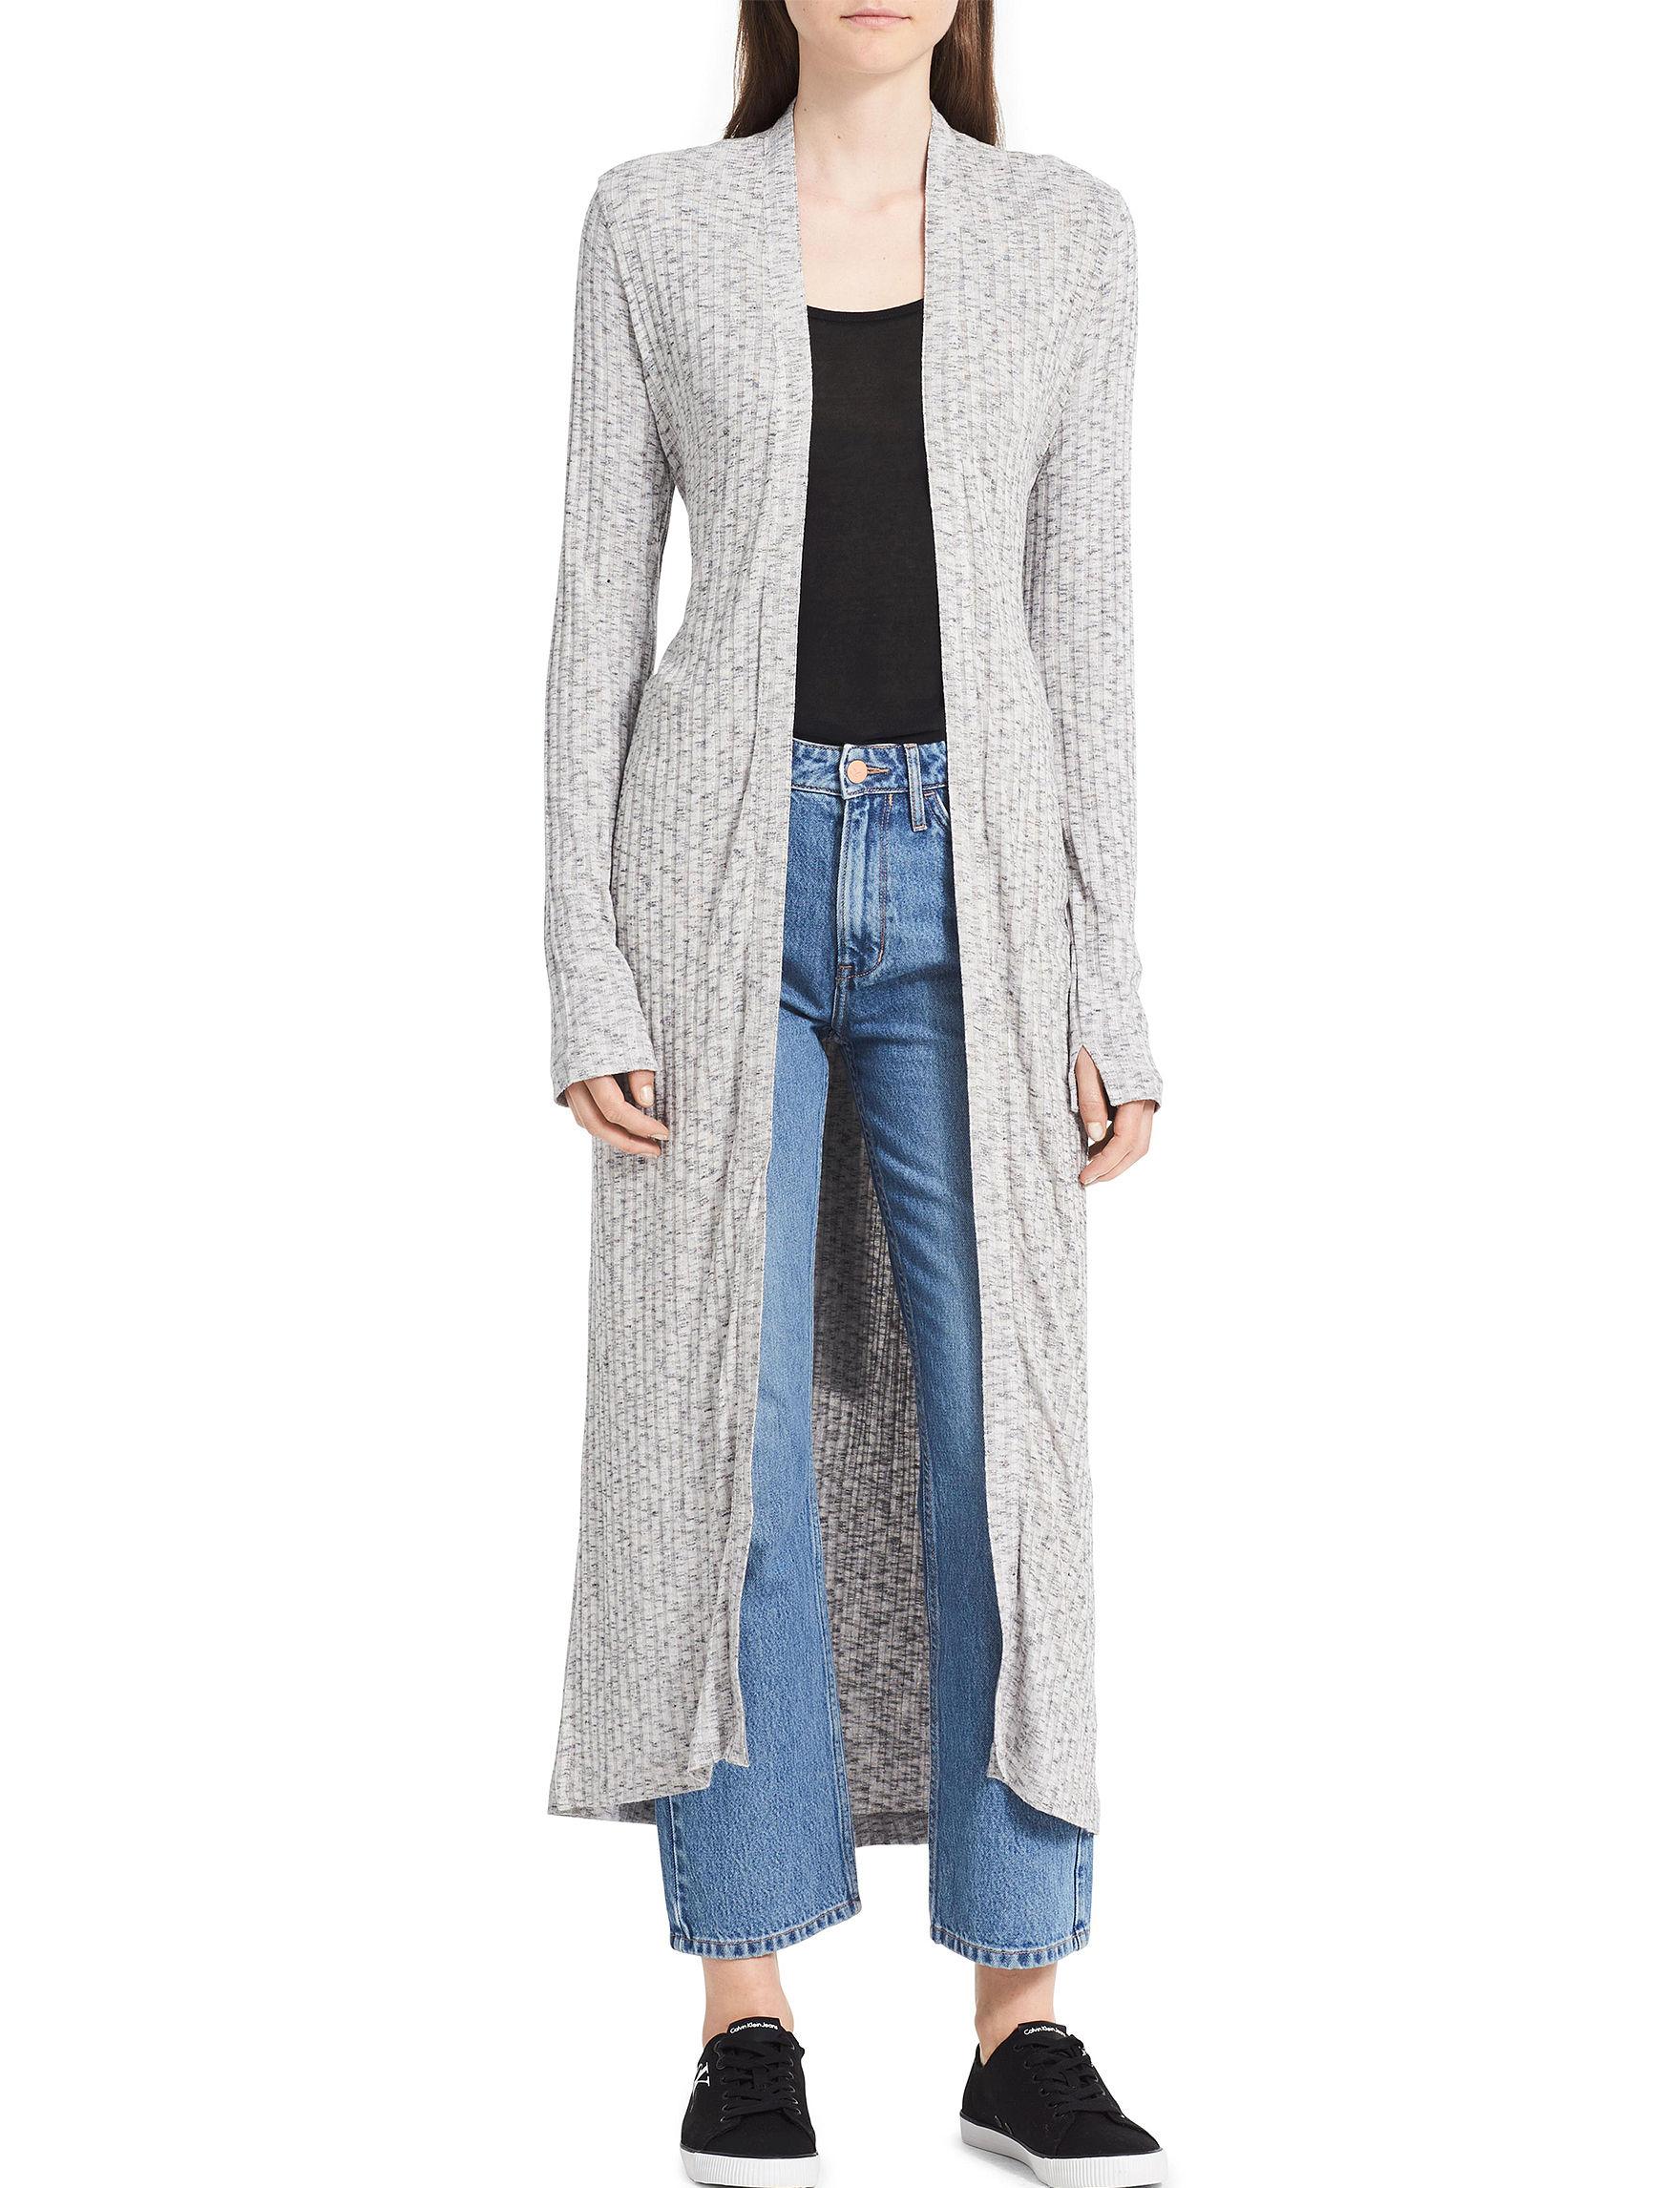 Calvin Klein Jeans Grey Cardigans